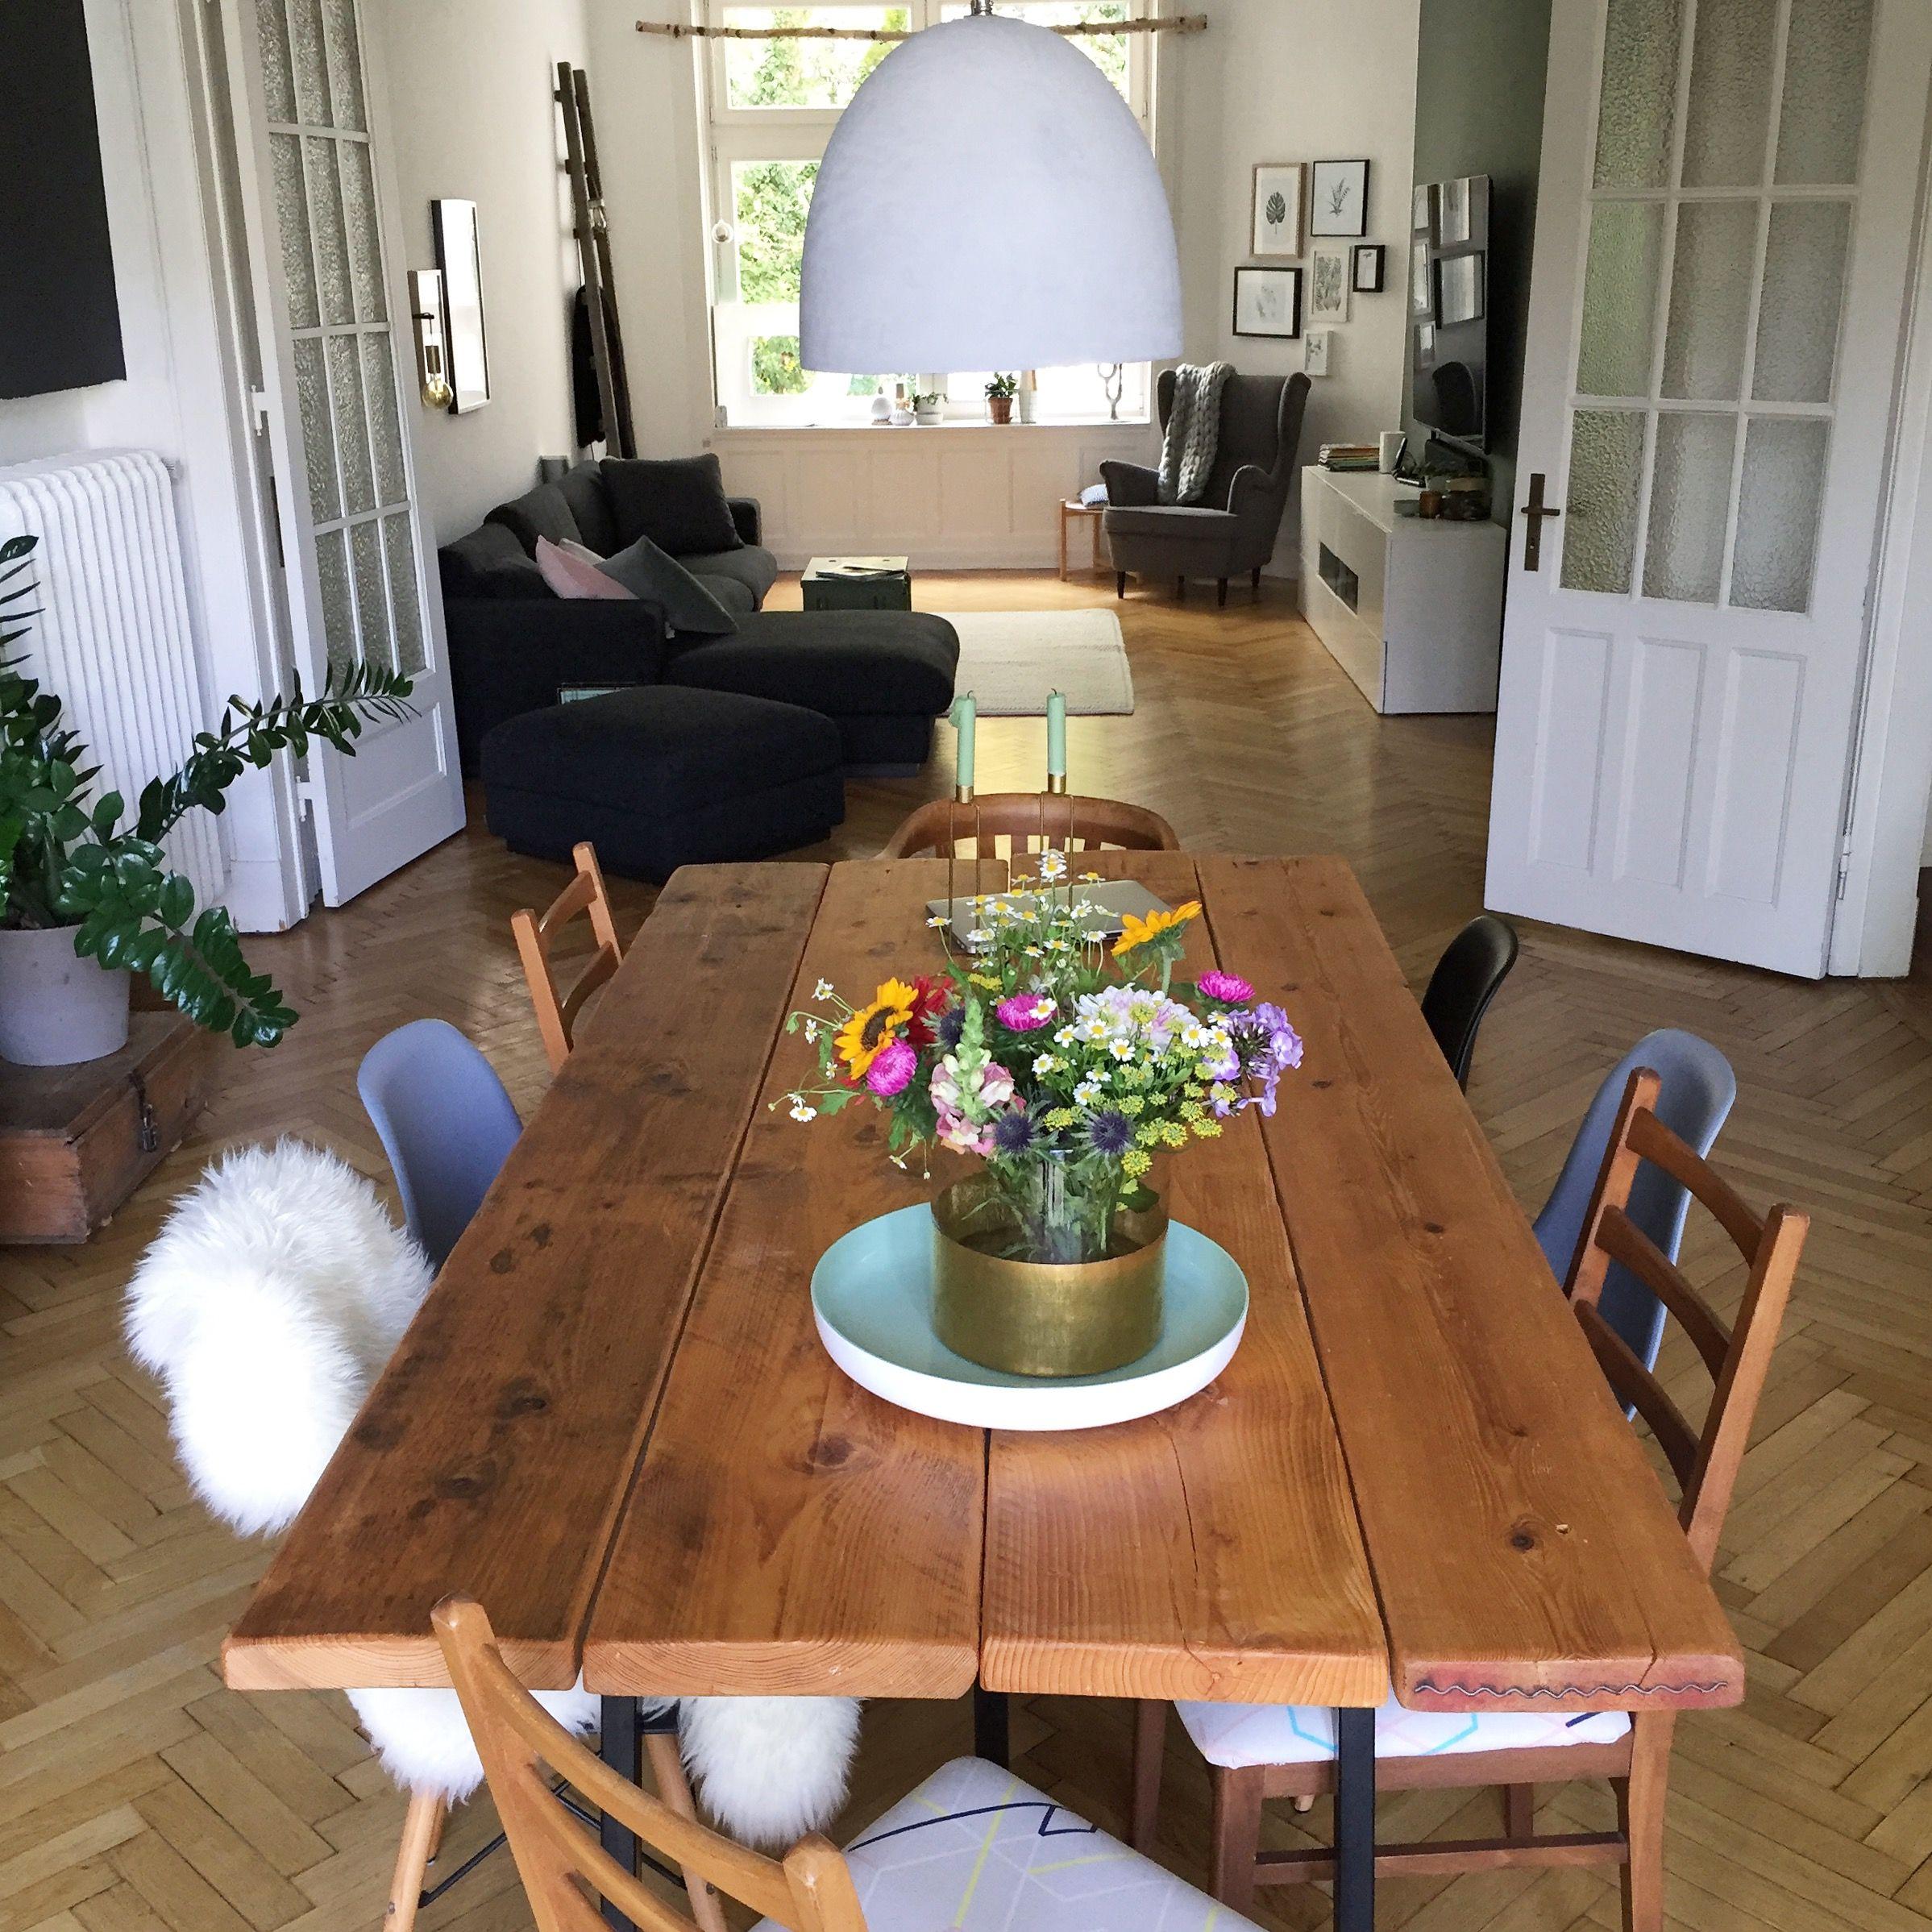 Esstisch, diningtable, diningroom, Esszimmer, livingroom ...